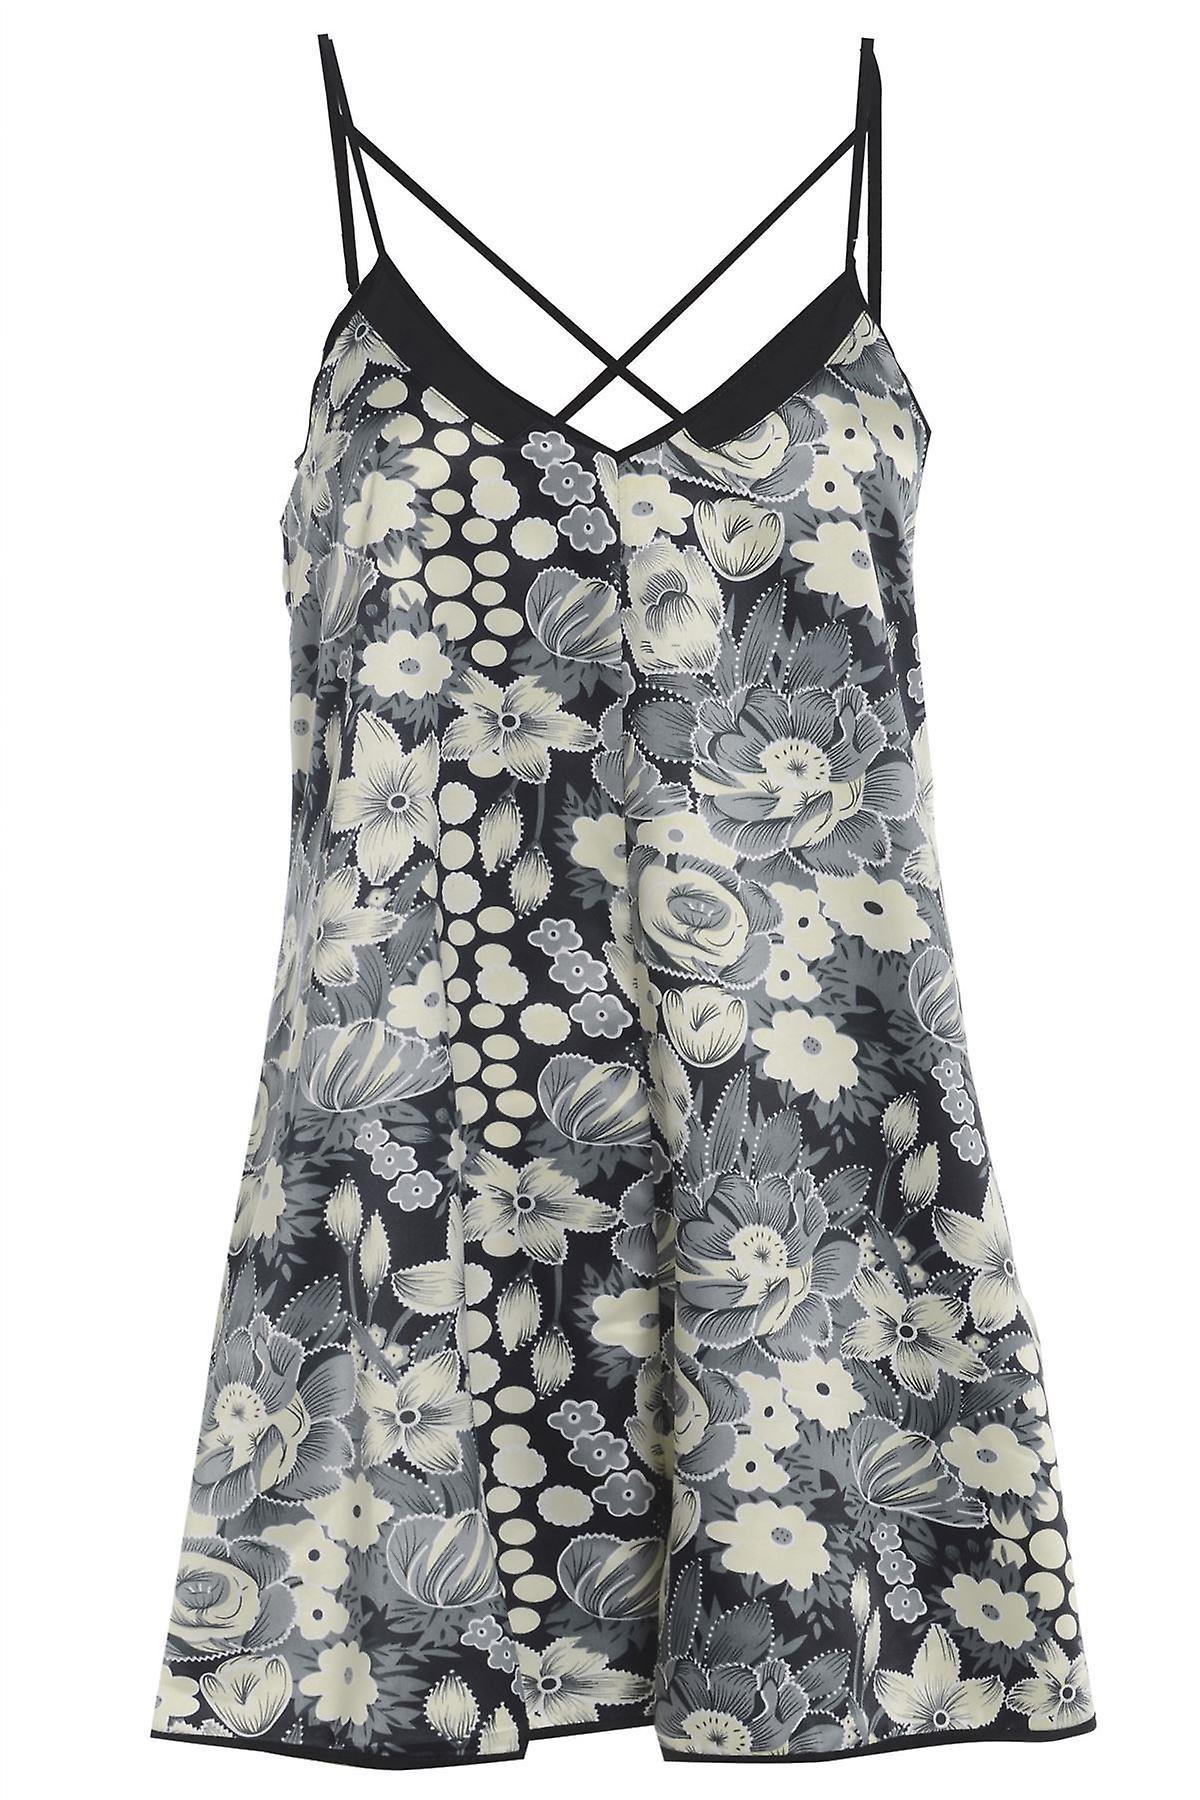 Floral Cross Back Playsuit TRS231-10